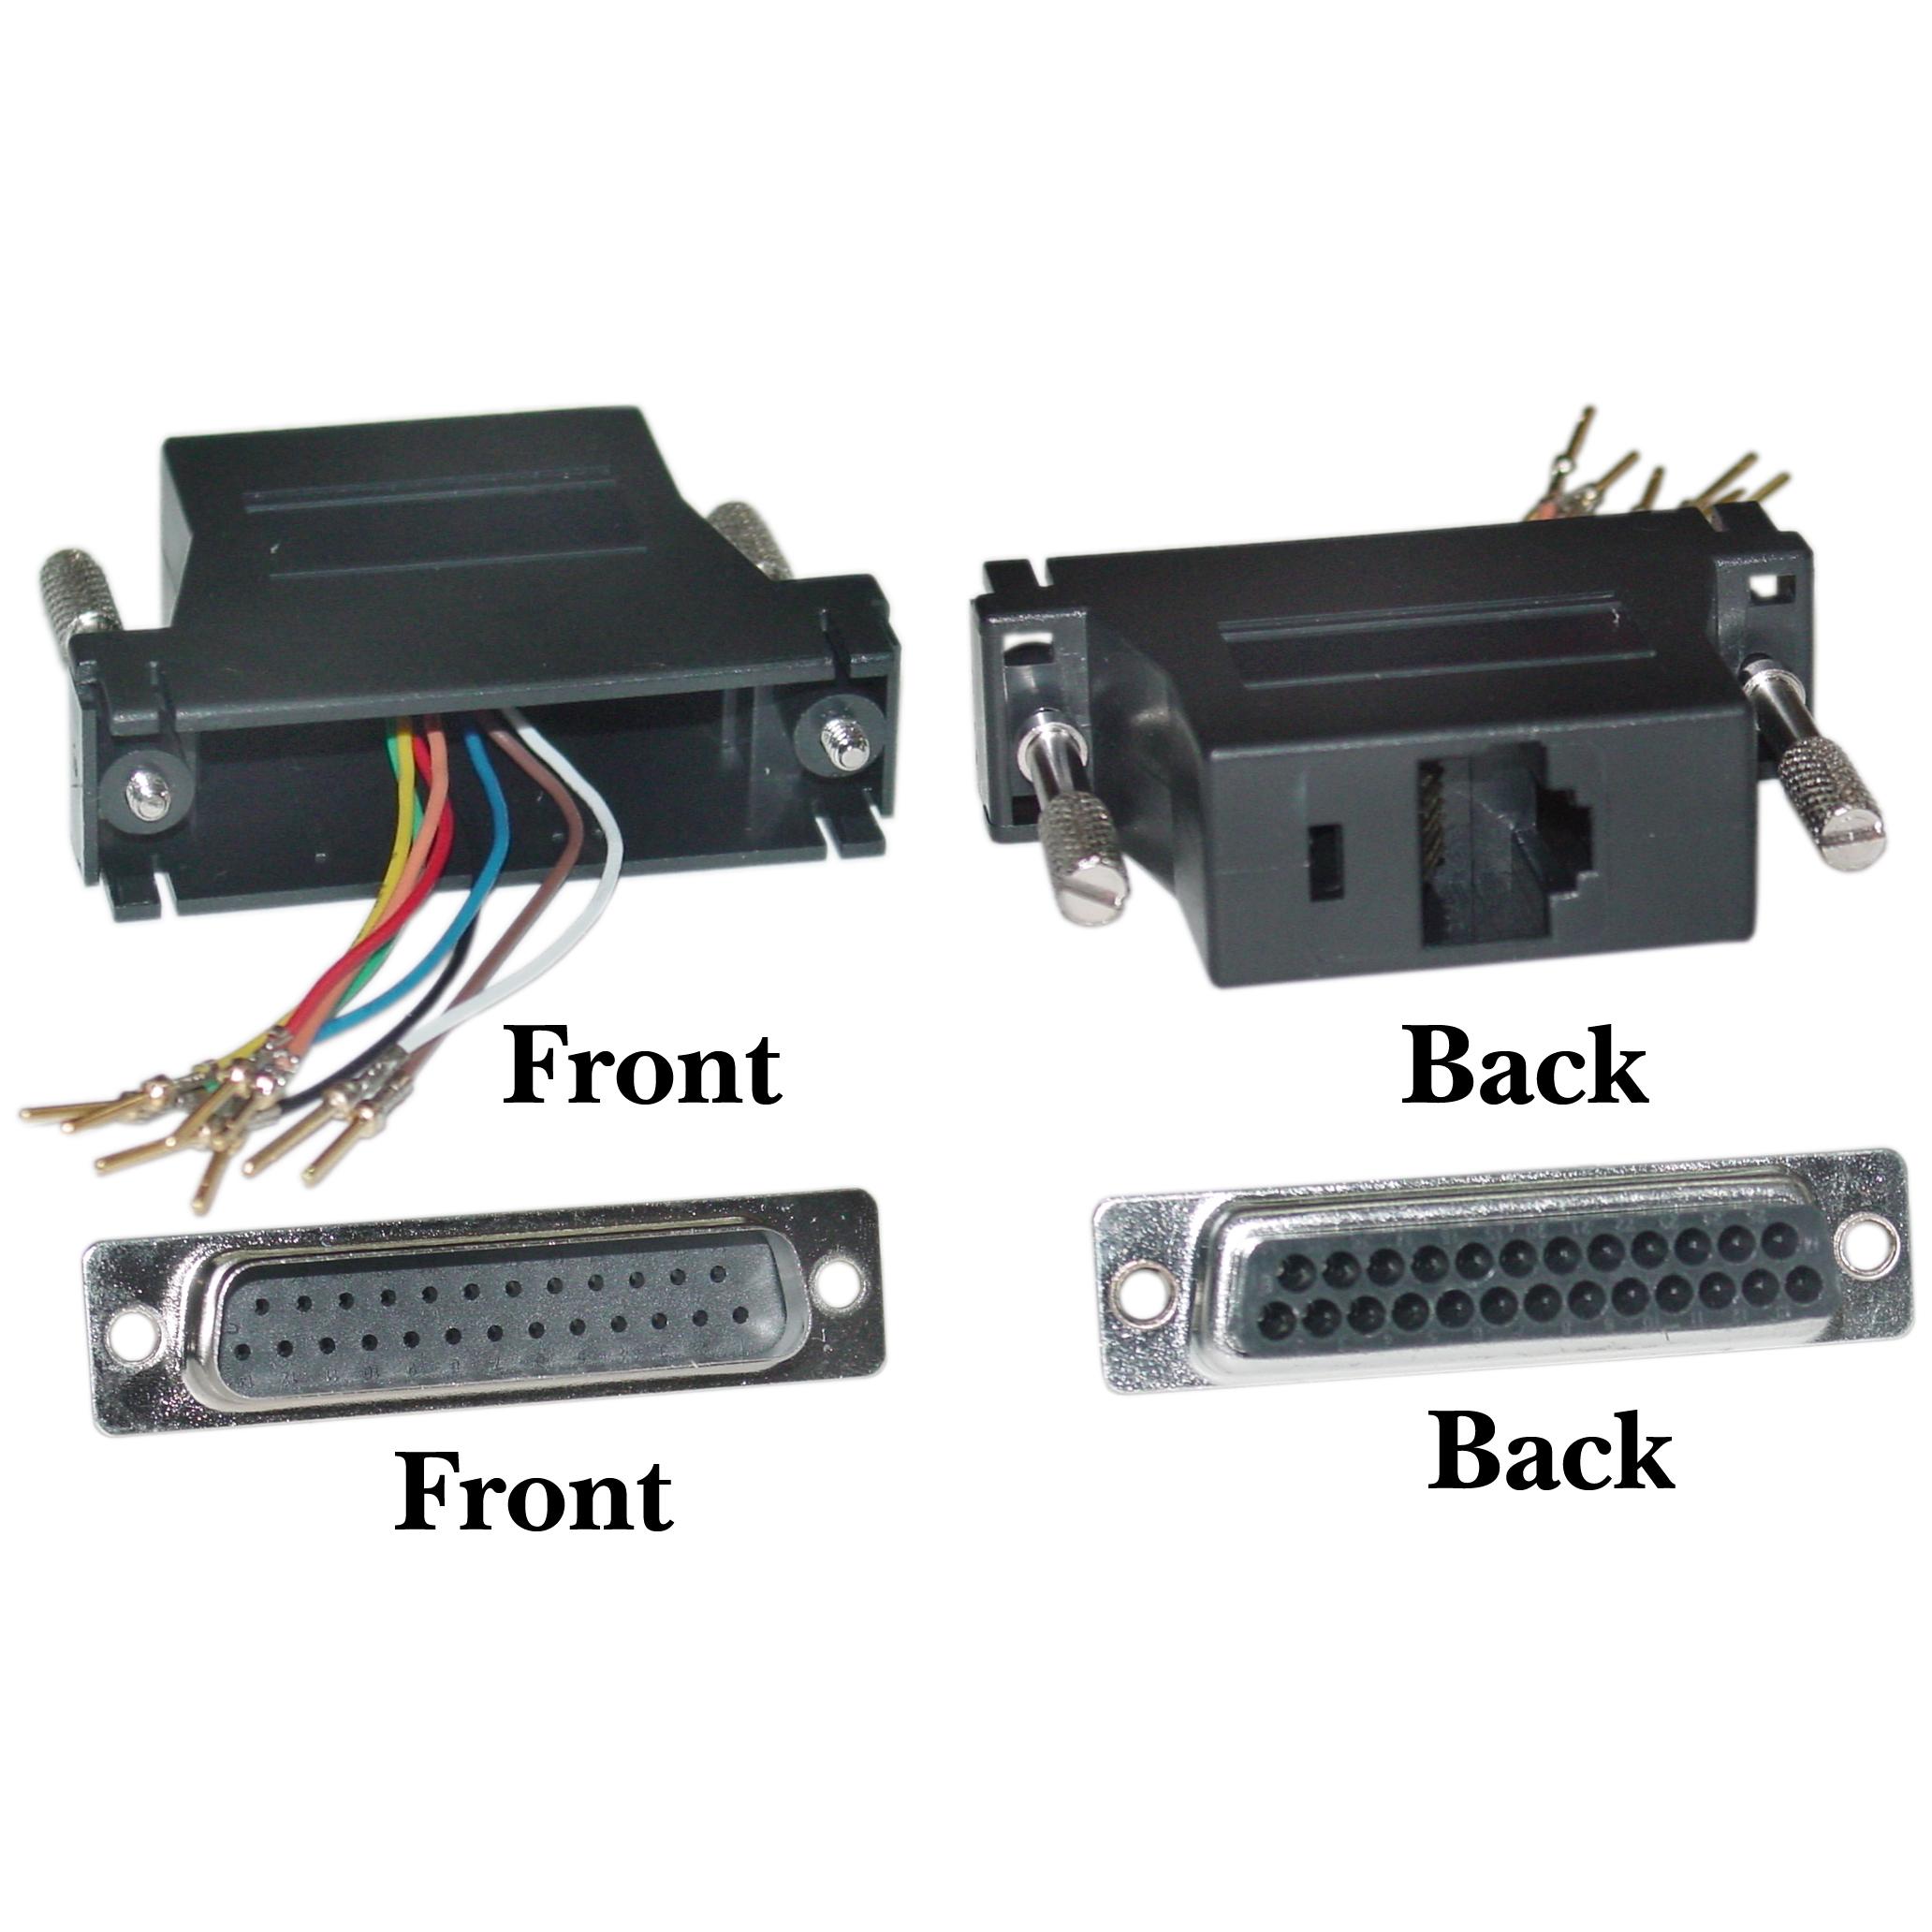 Db25 Male To Rj45 Female Modular Adapter